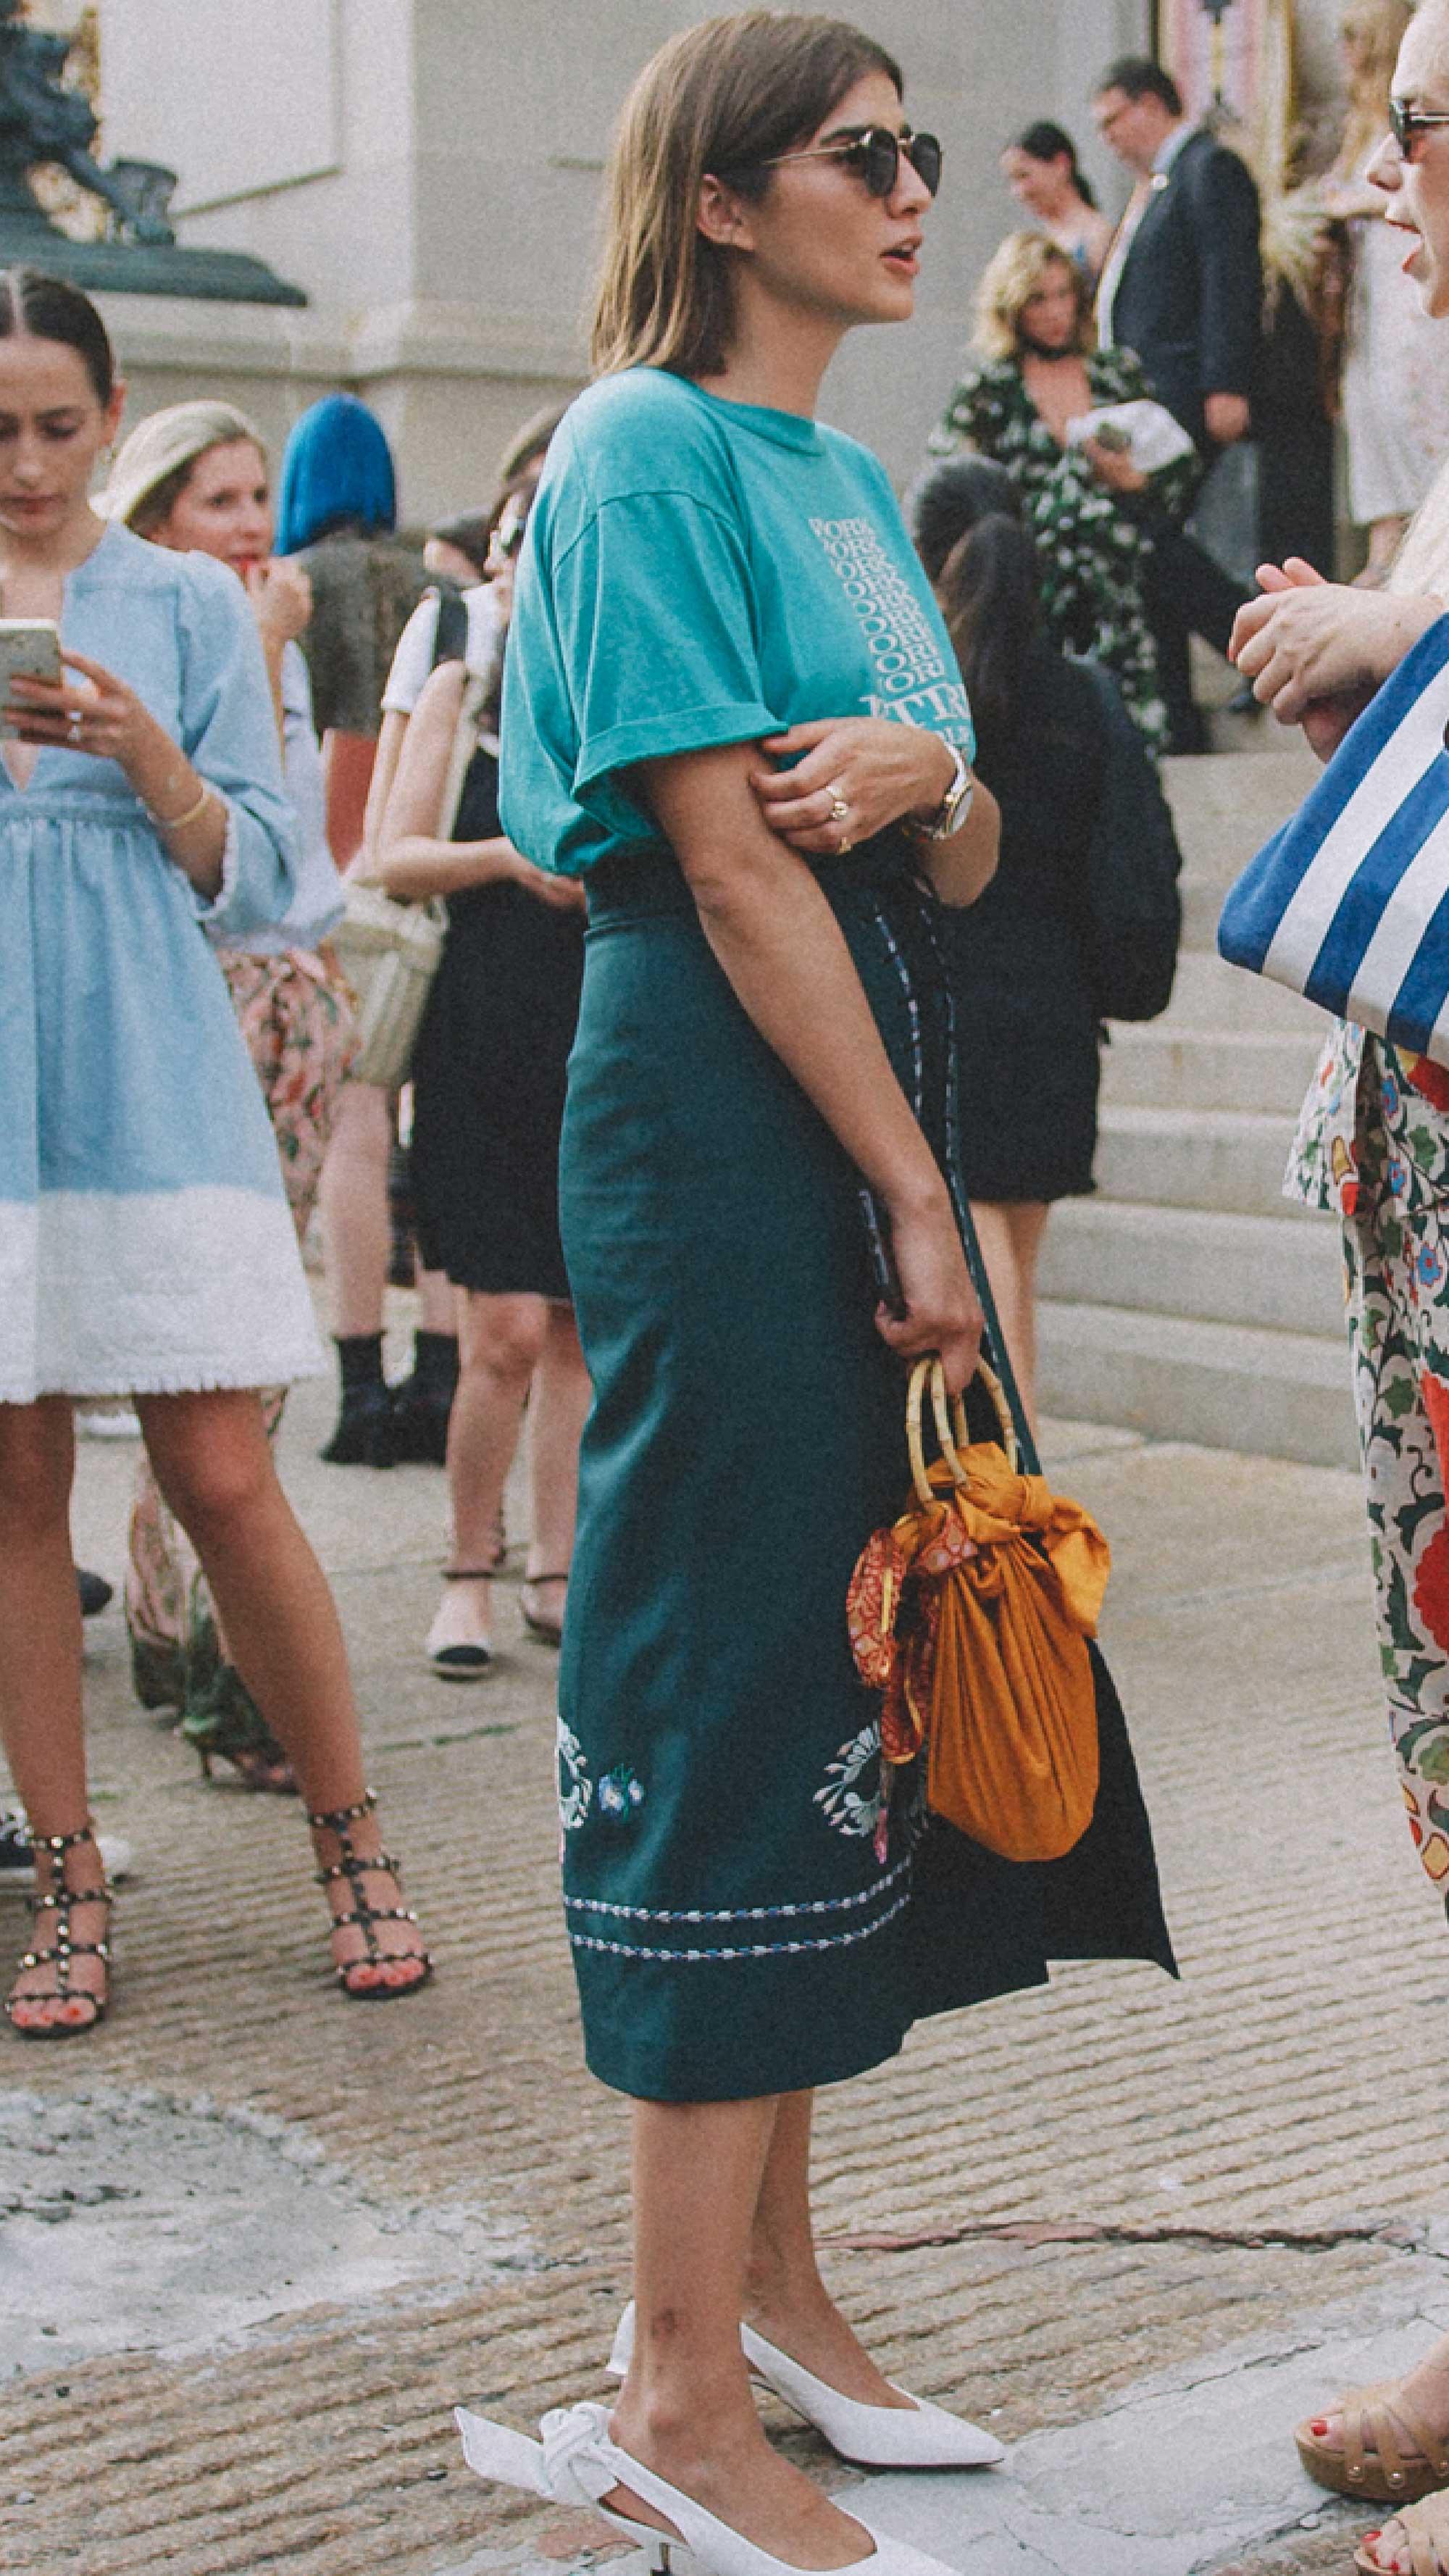 New-York-Fashion-Week-NYFW-SS18-street-style-day-one13.jpg